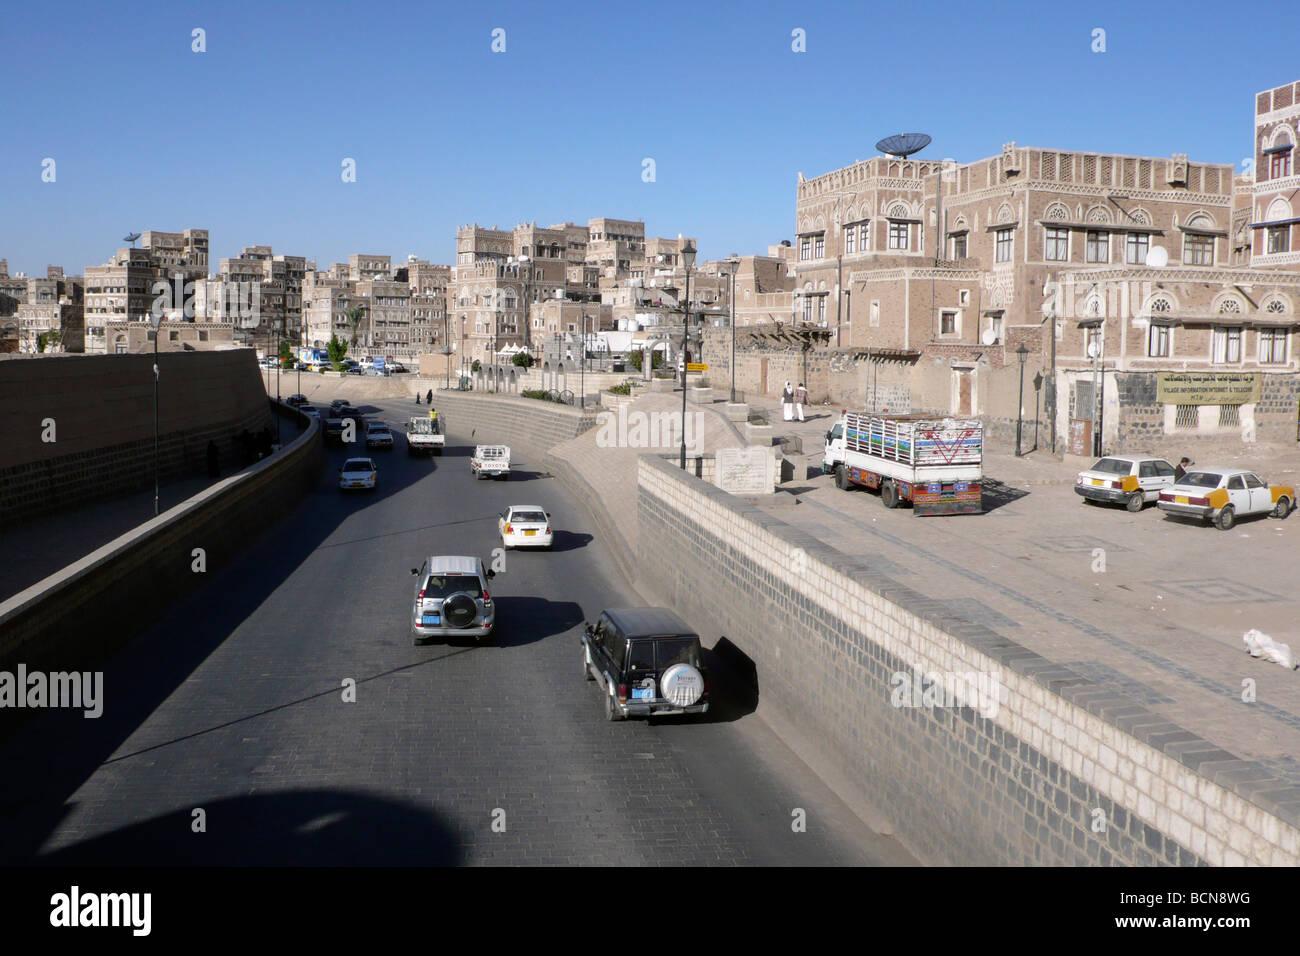 yemen sana a - Stock Image